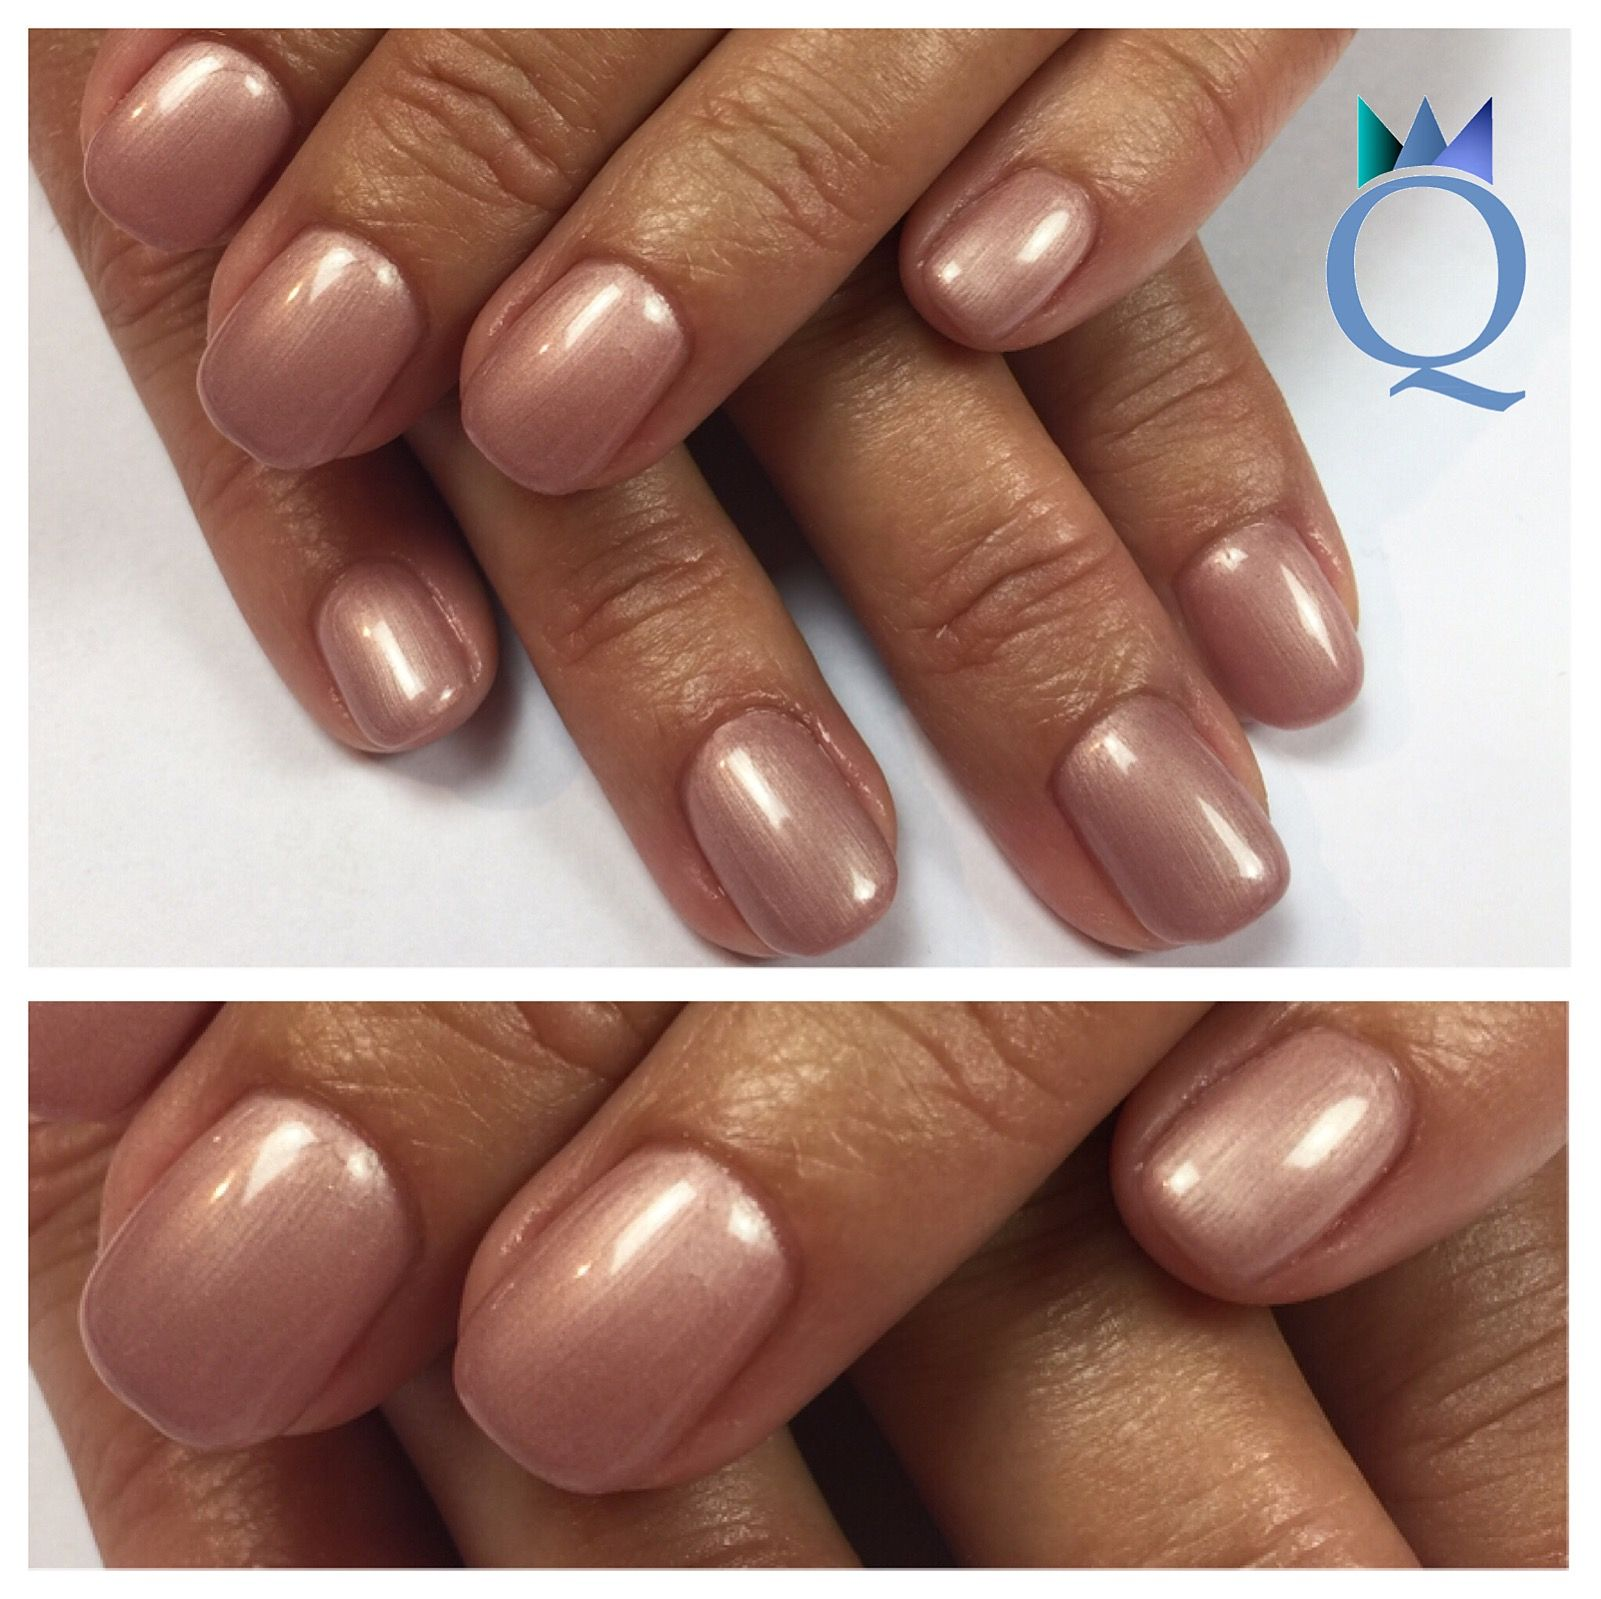 Wunderbar Nageldesign Braun Beige Beste Wahl #shortnails #gelnails #nails #beige #shimmer #kurzenägel #gelnägel